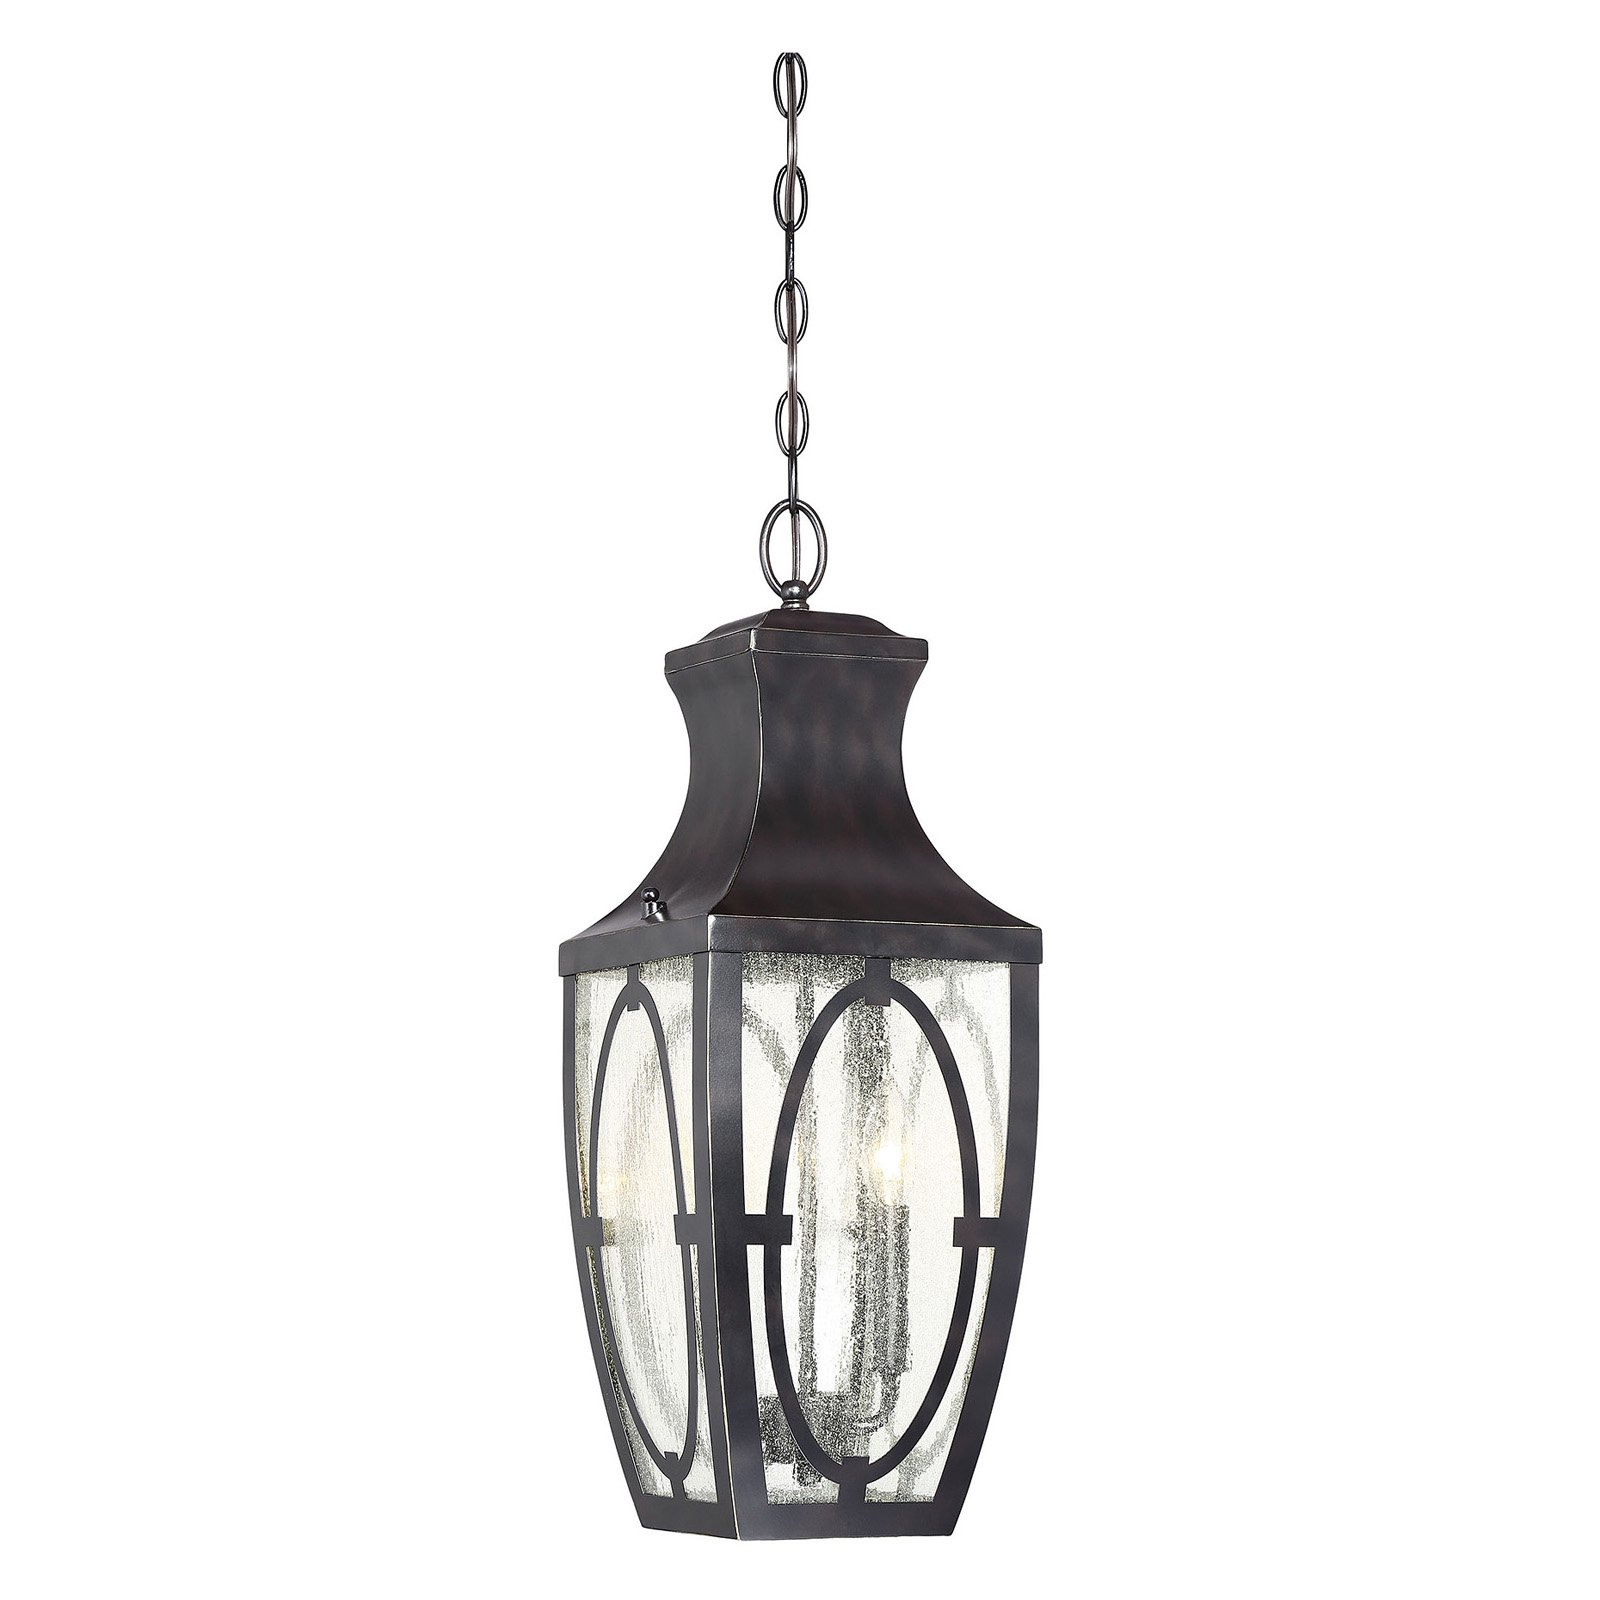 Savoy House Shelton 5-263-213 Outdoor Hanging Lantern by Savoy House Lighting